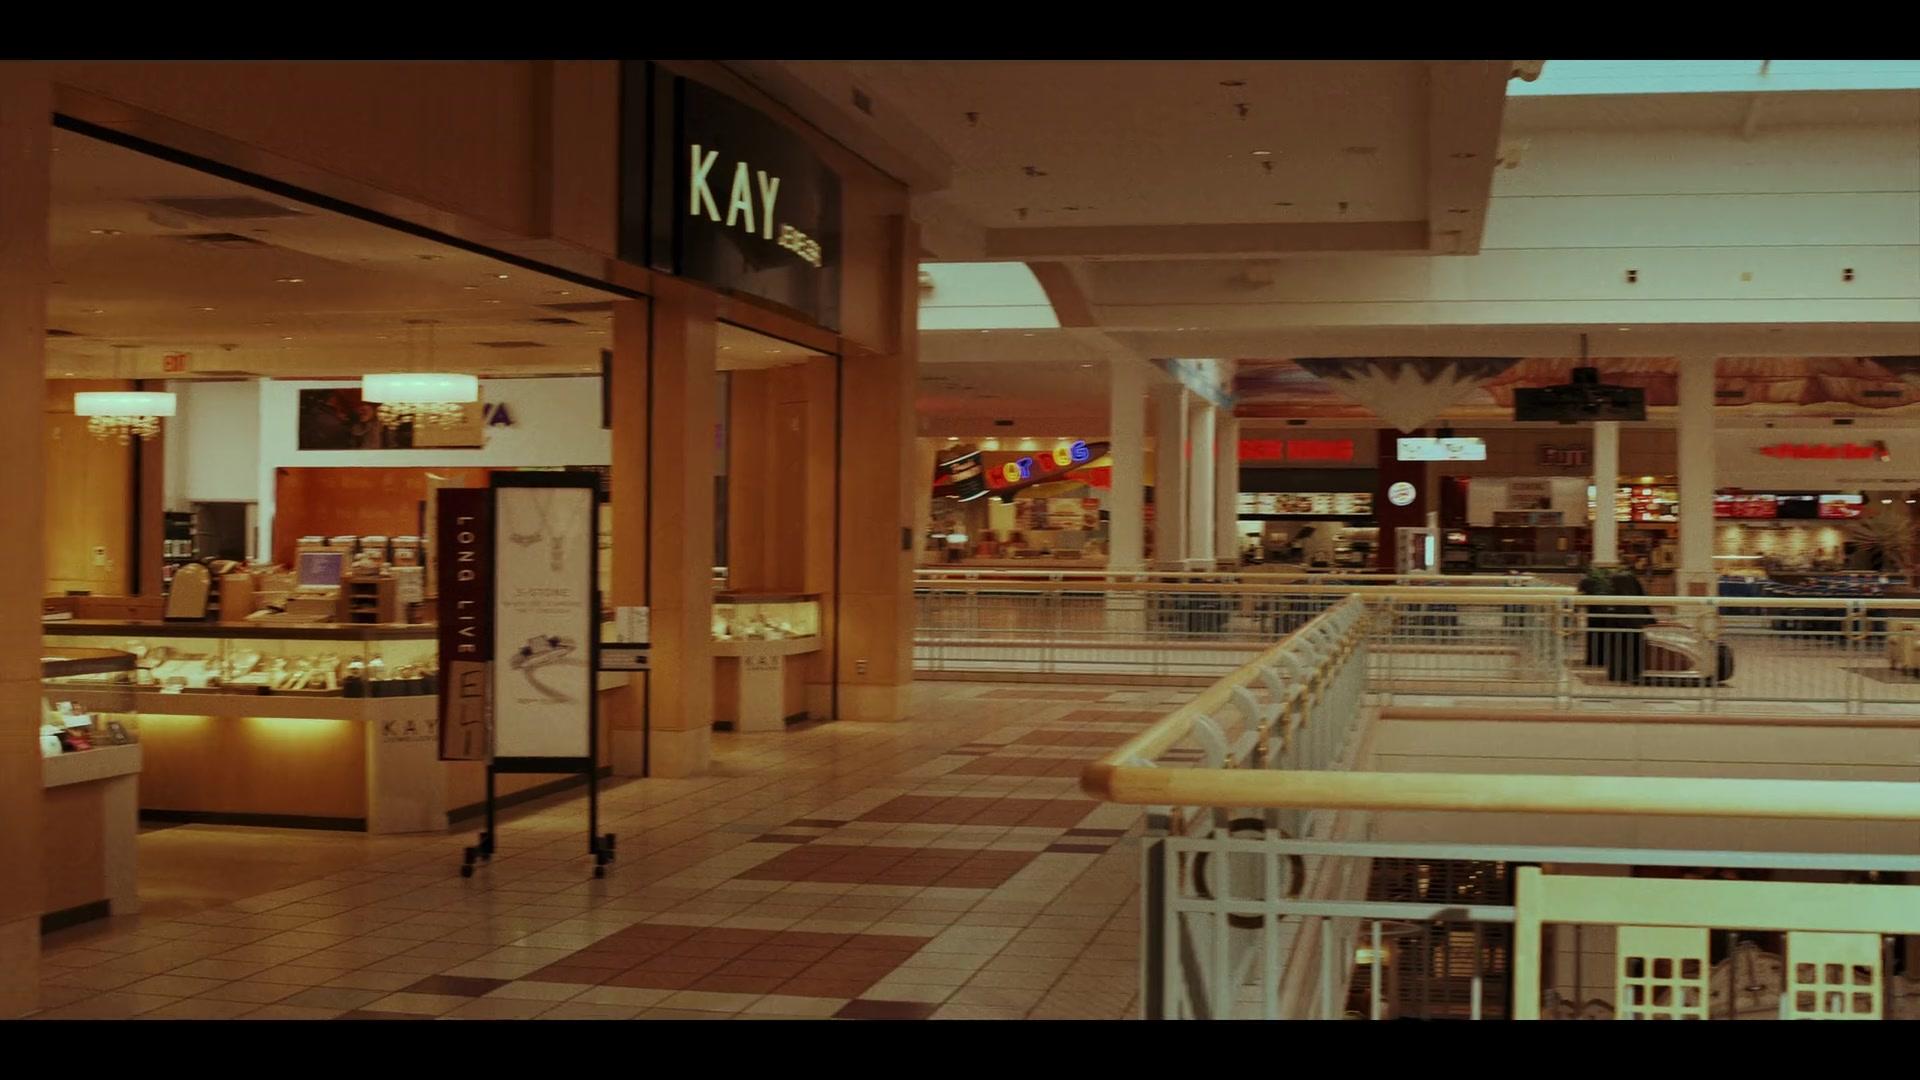 Kay One Shop